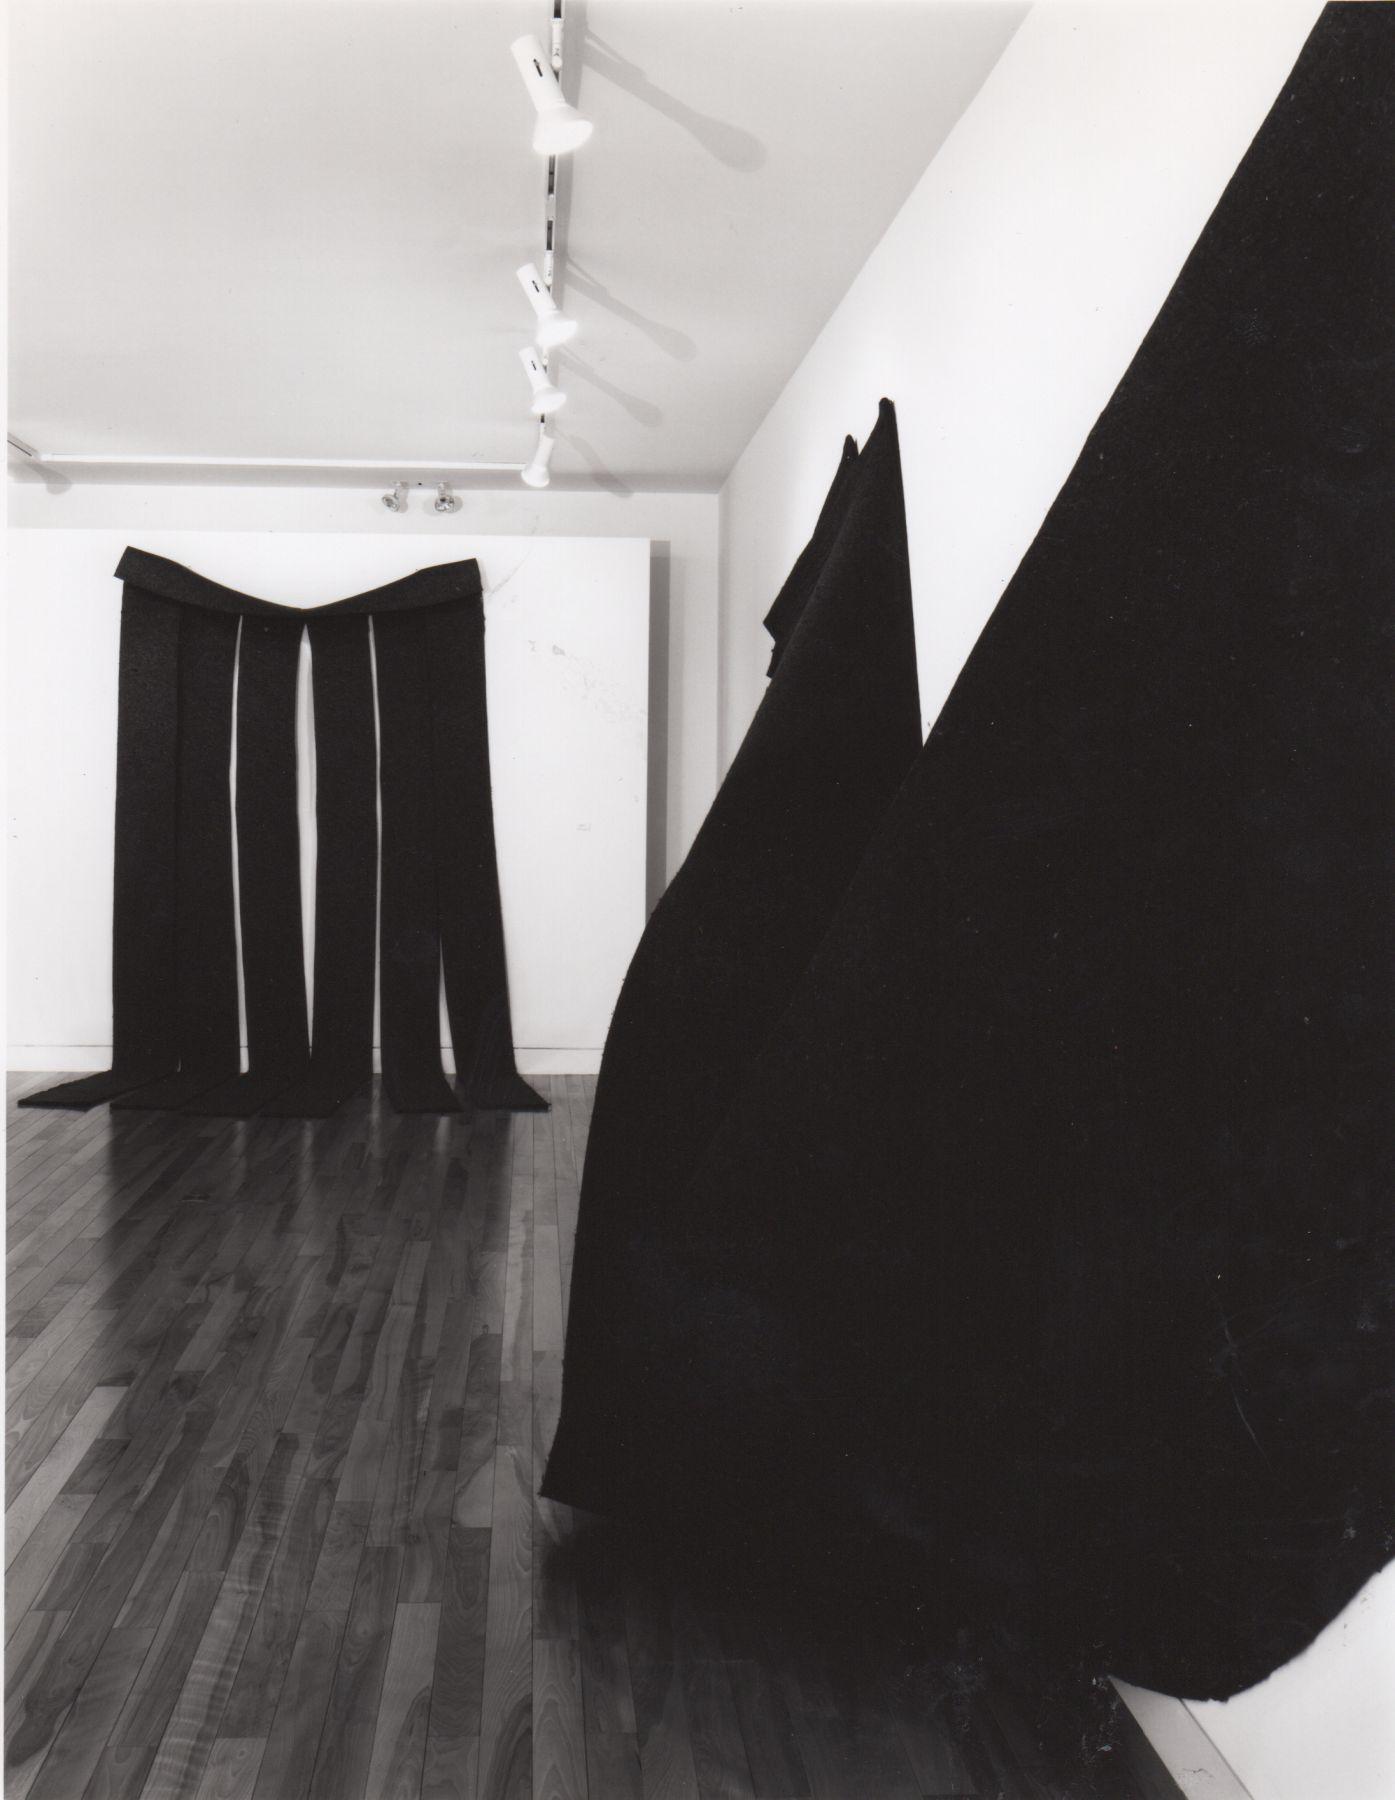 Installation view, Robert Morris: Early Felts, 59 EAST 79